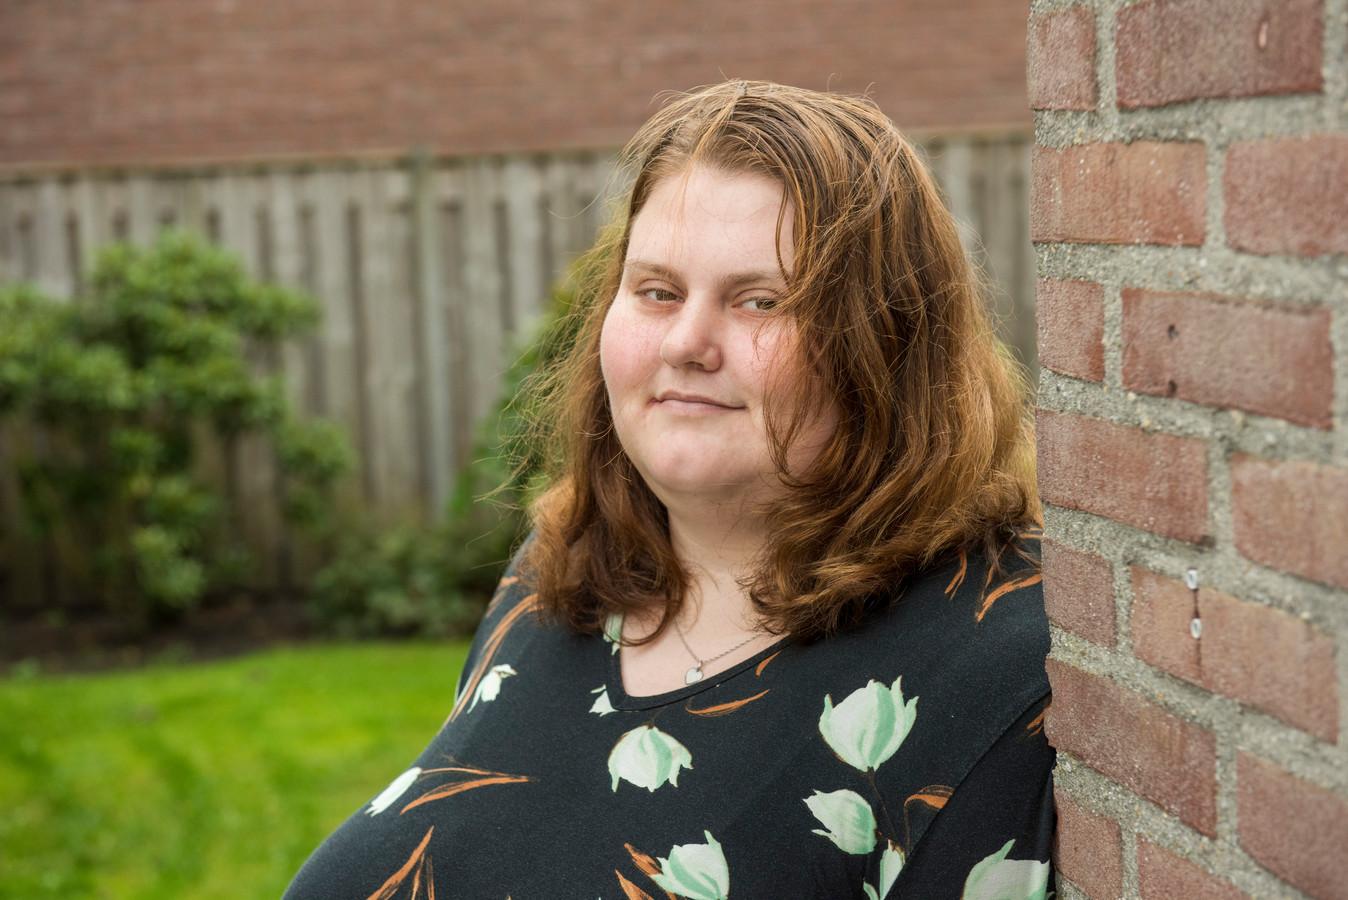 Nikky Rens kreeg dinsdag 3 november euthanasie, na een leven vol tegenslag en depressies.